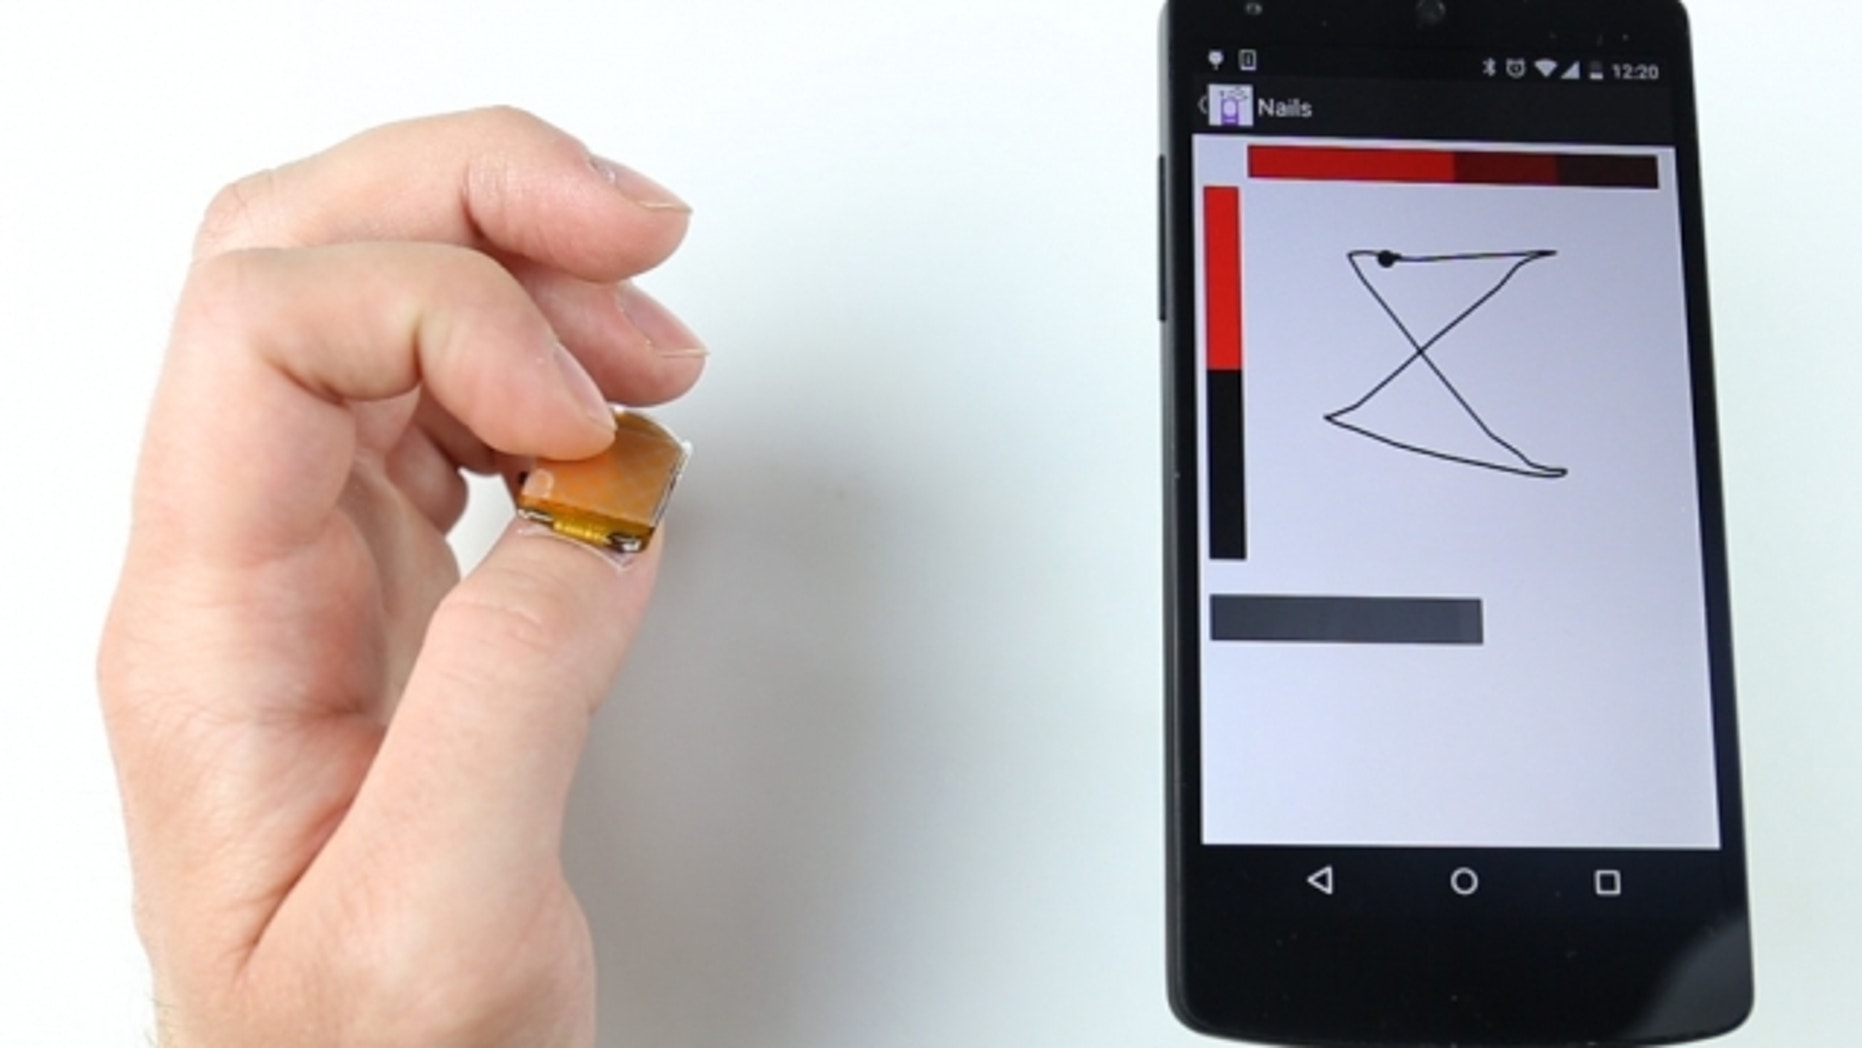 NailO wearable device.